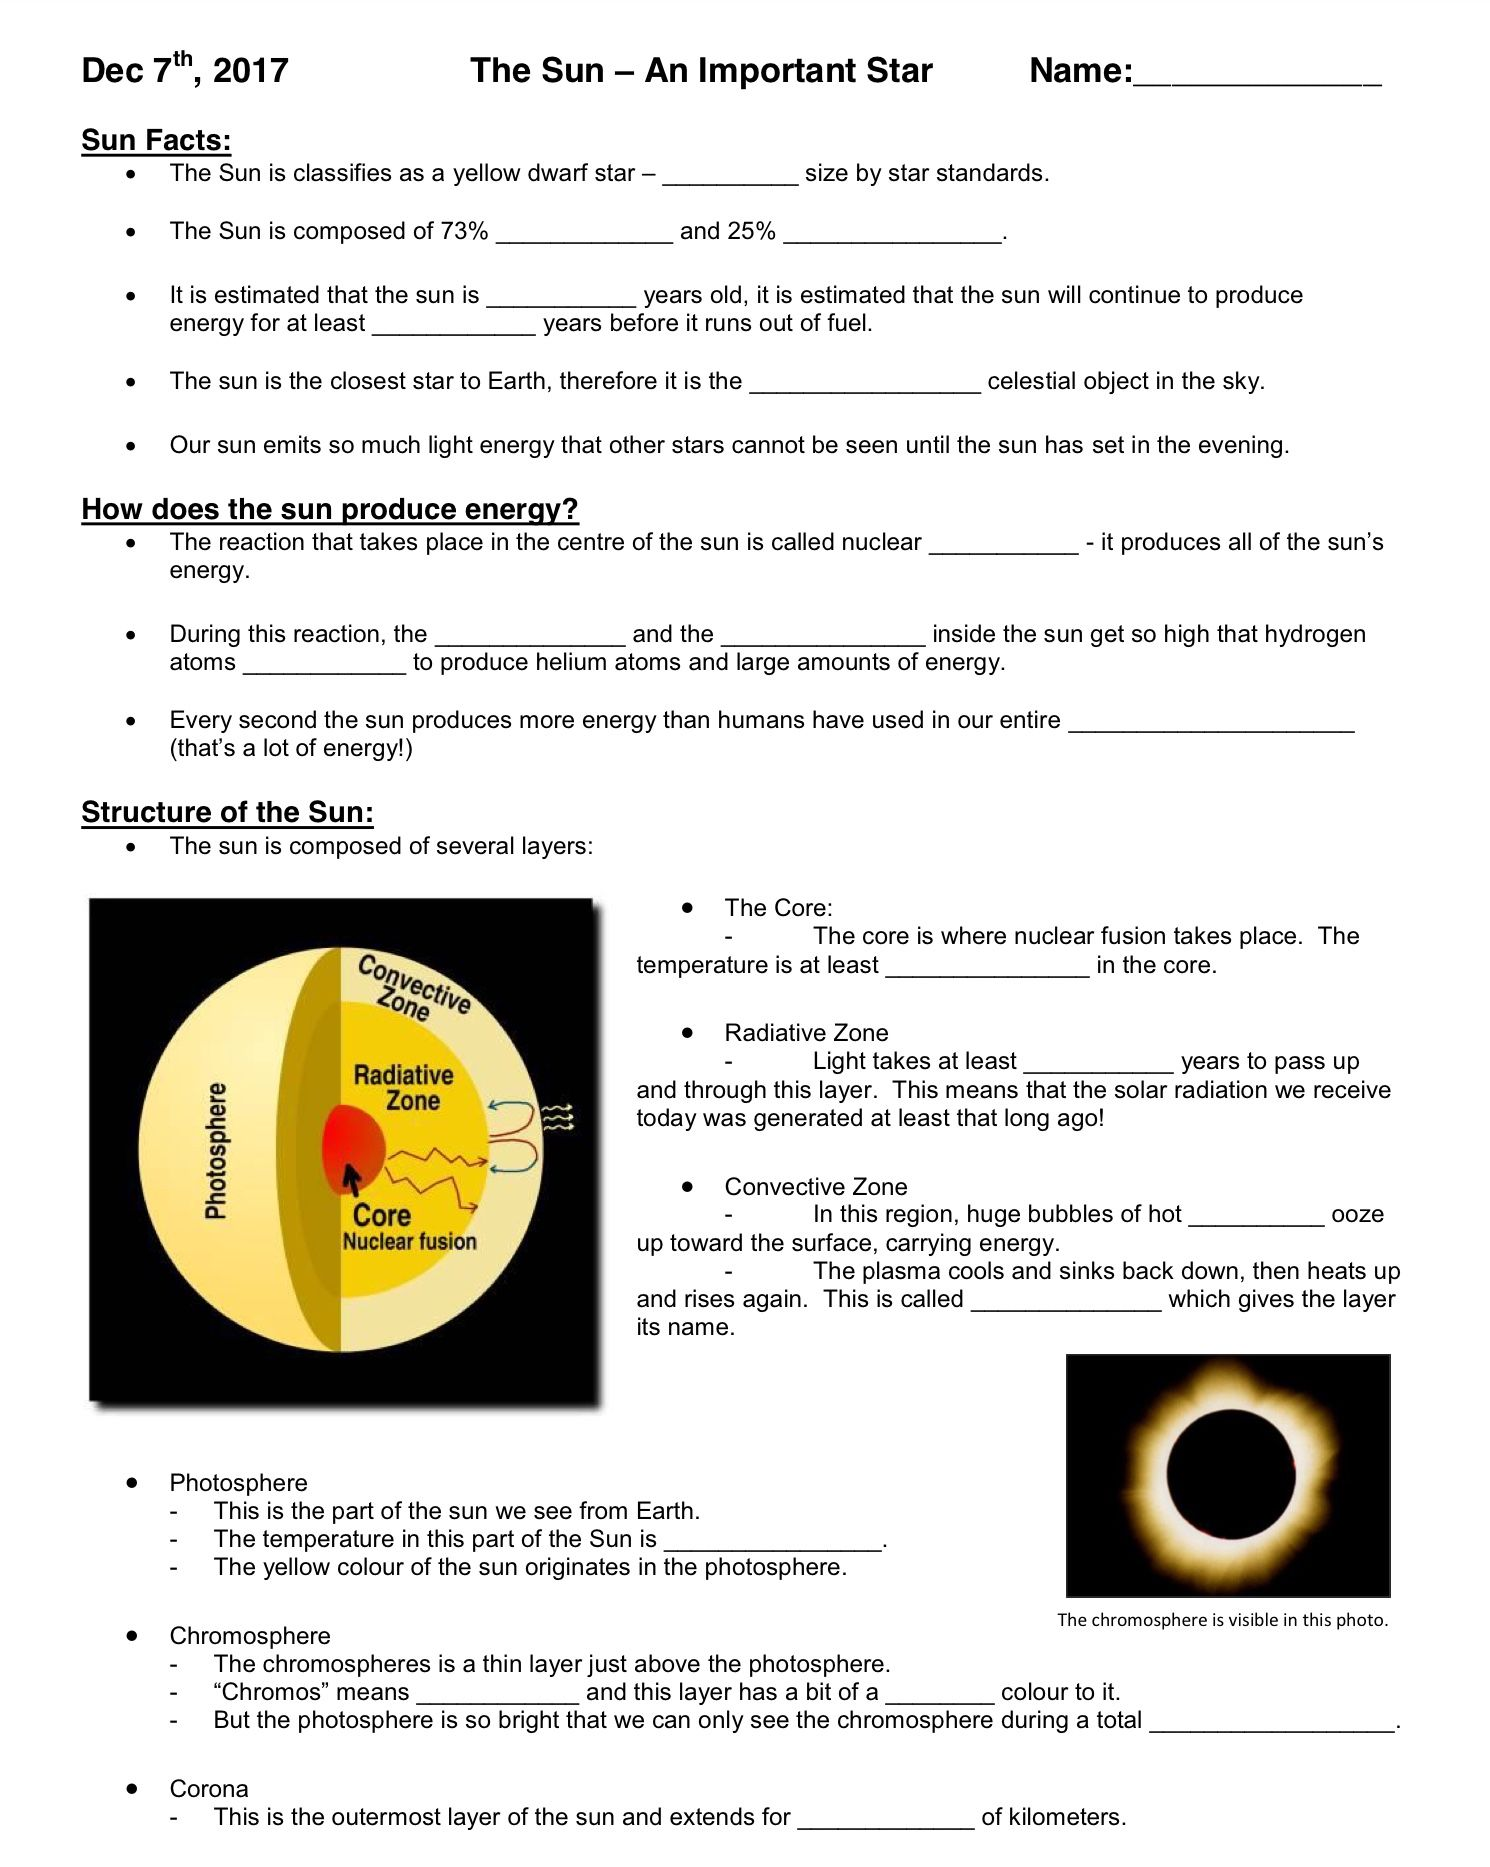 The Sun An Important Star Worksheet December 7 2017 Science Worksheets Kids Worksheets Printables Learning Science